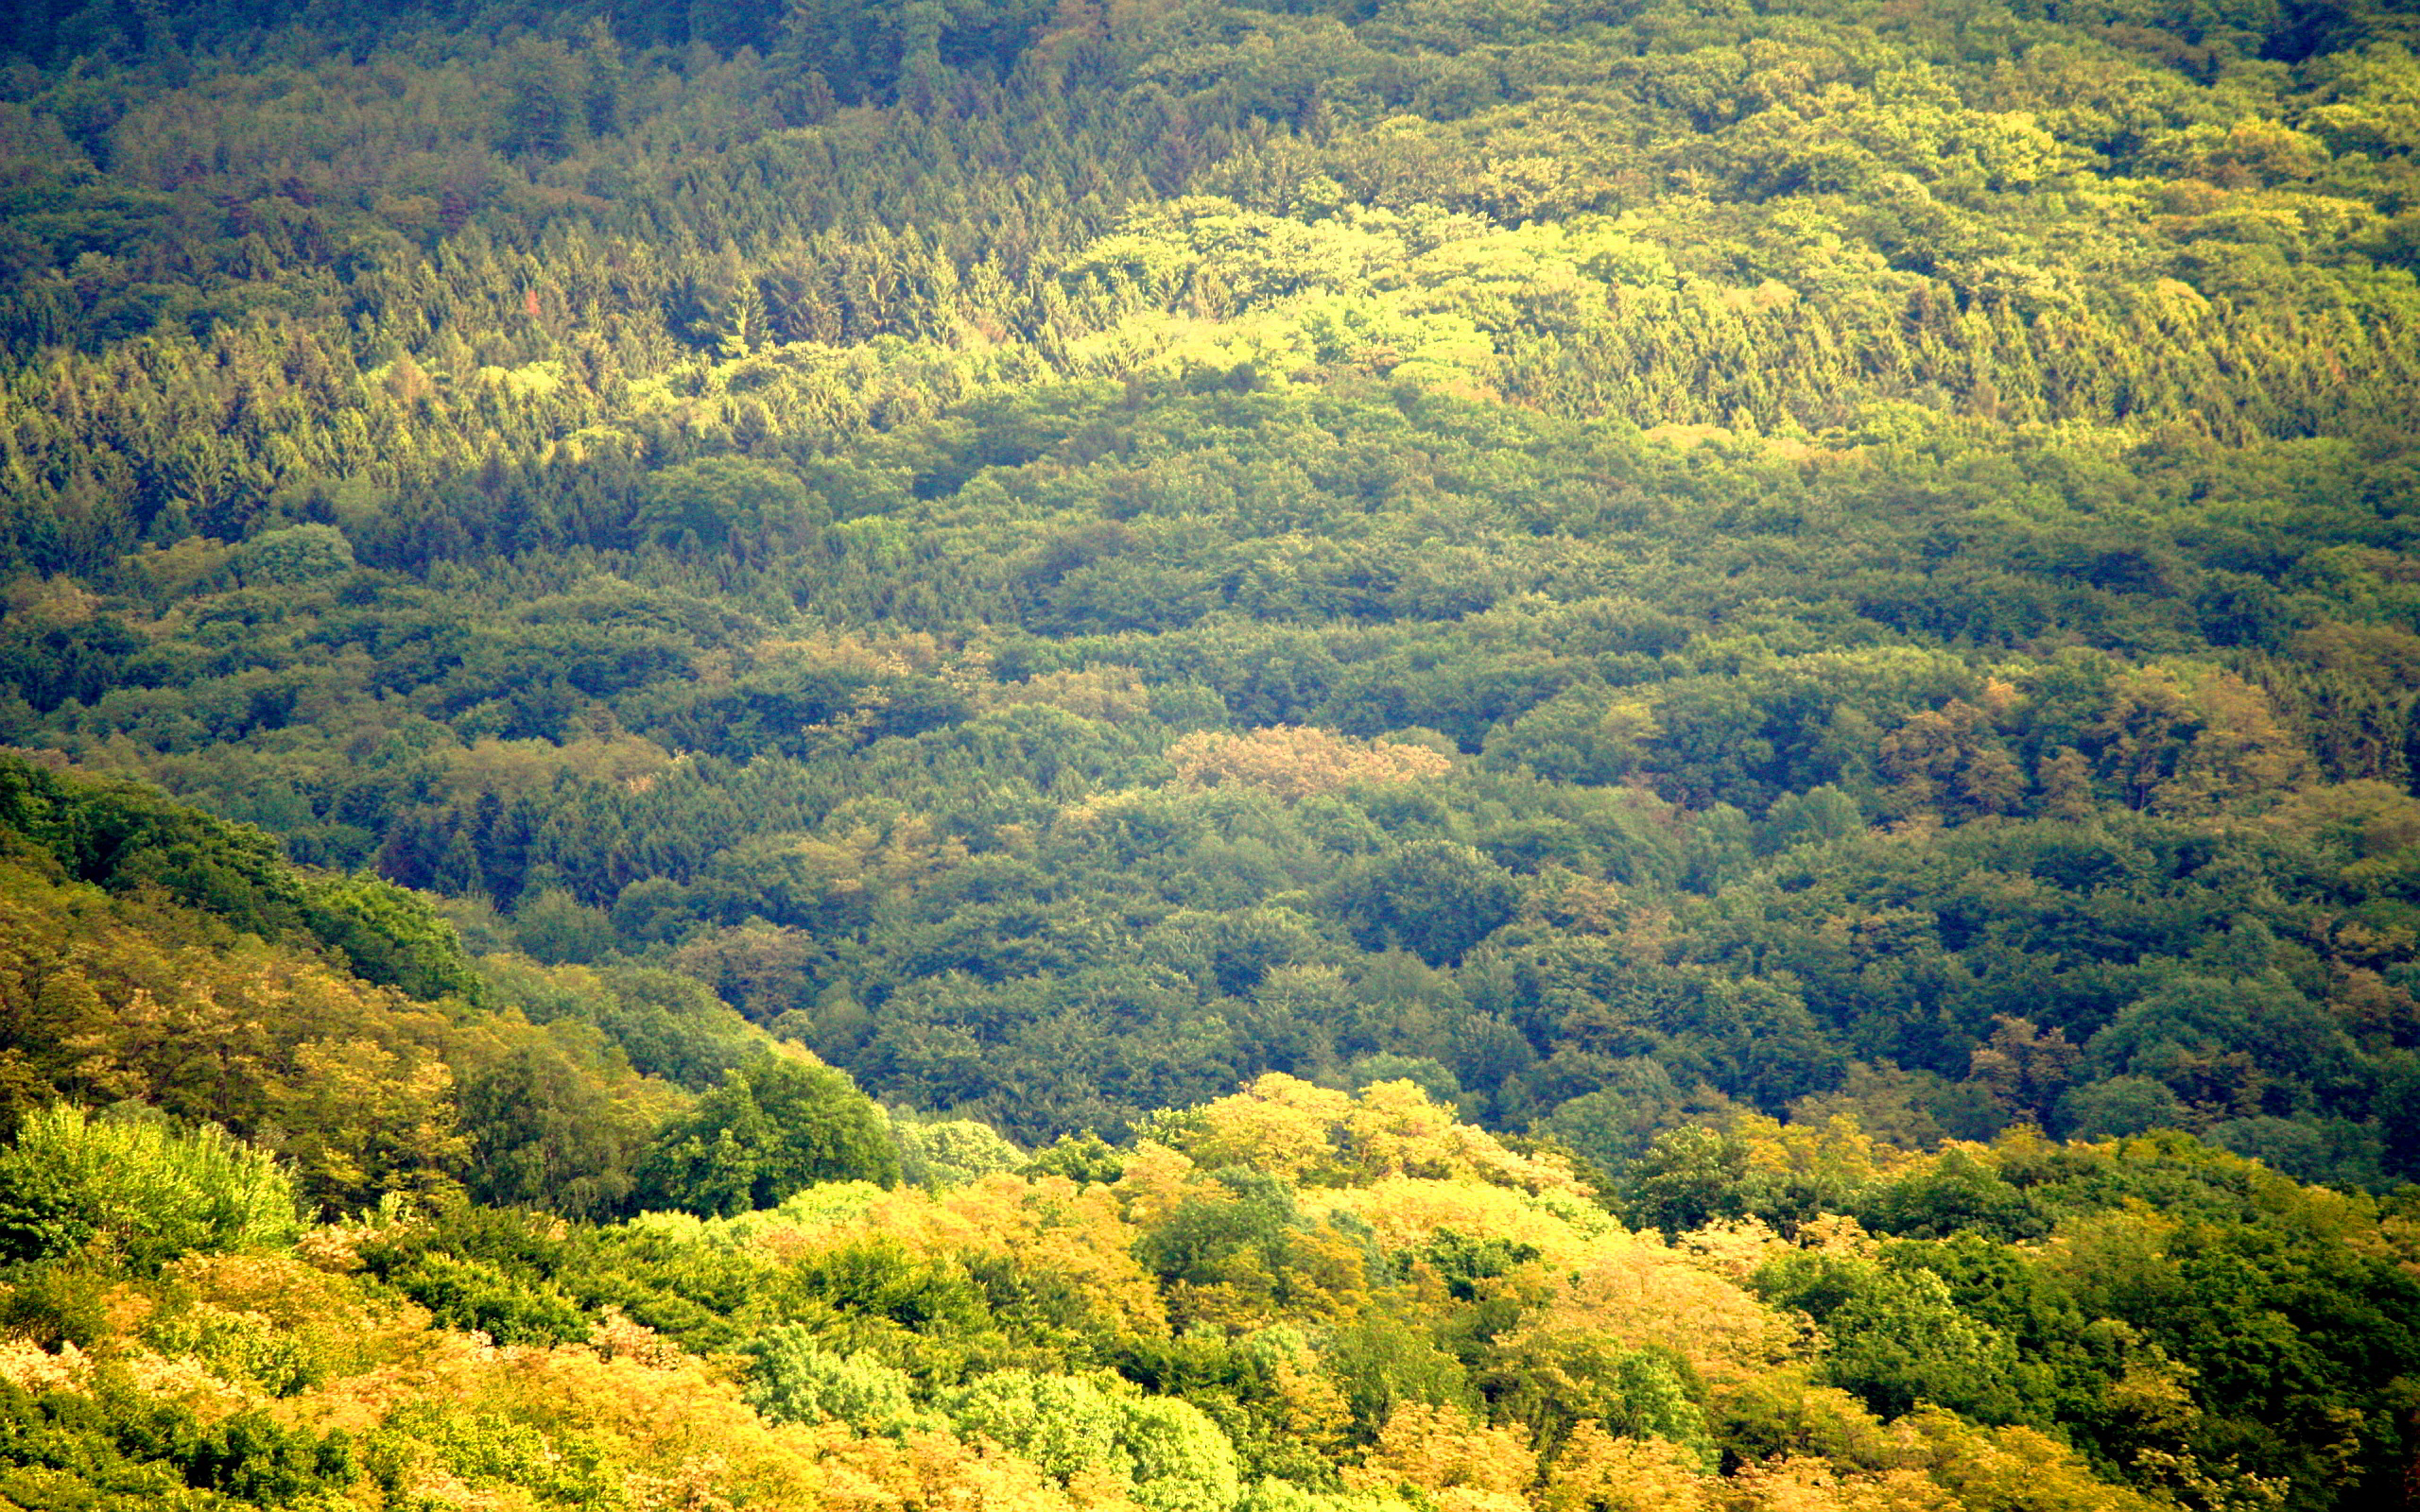 thick wallpaper,vegetation,natural landscape,nature,tropical and subtropical coniferous forests,natural environment